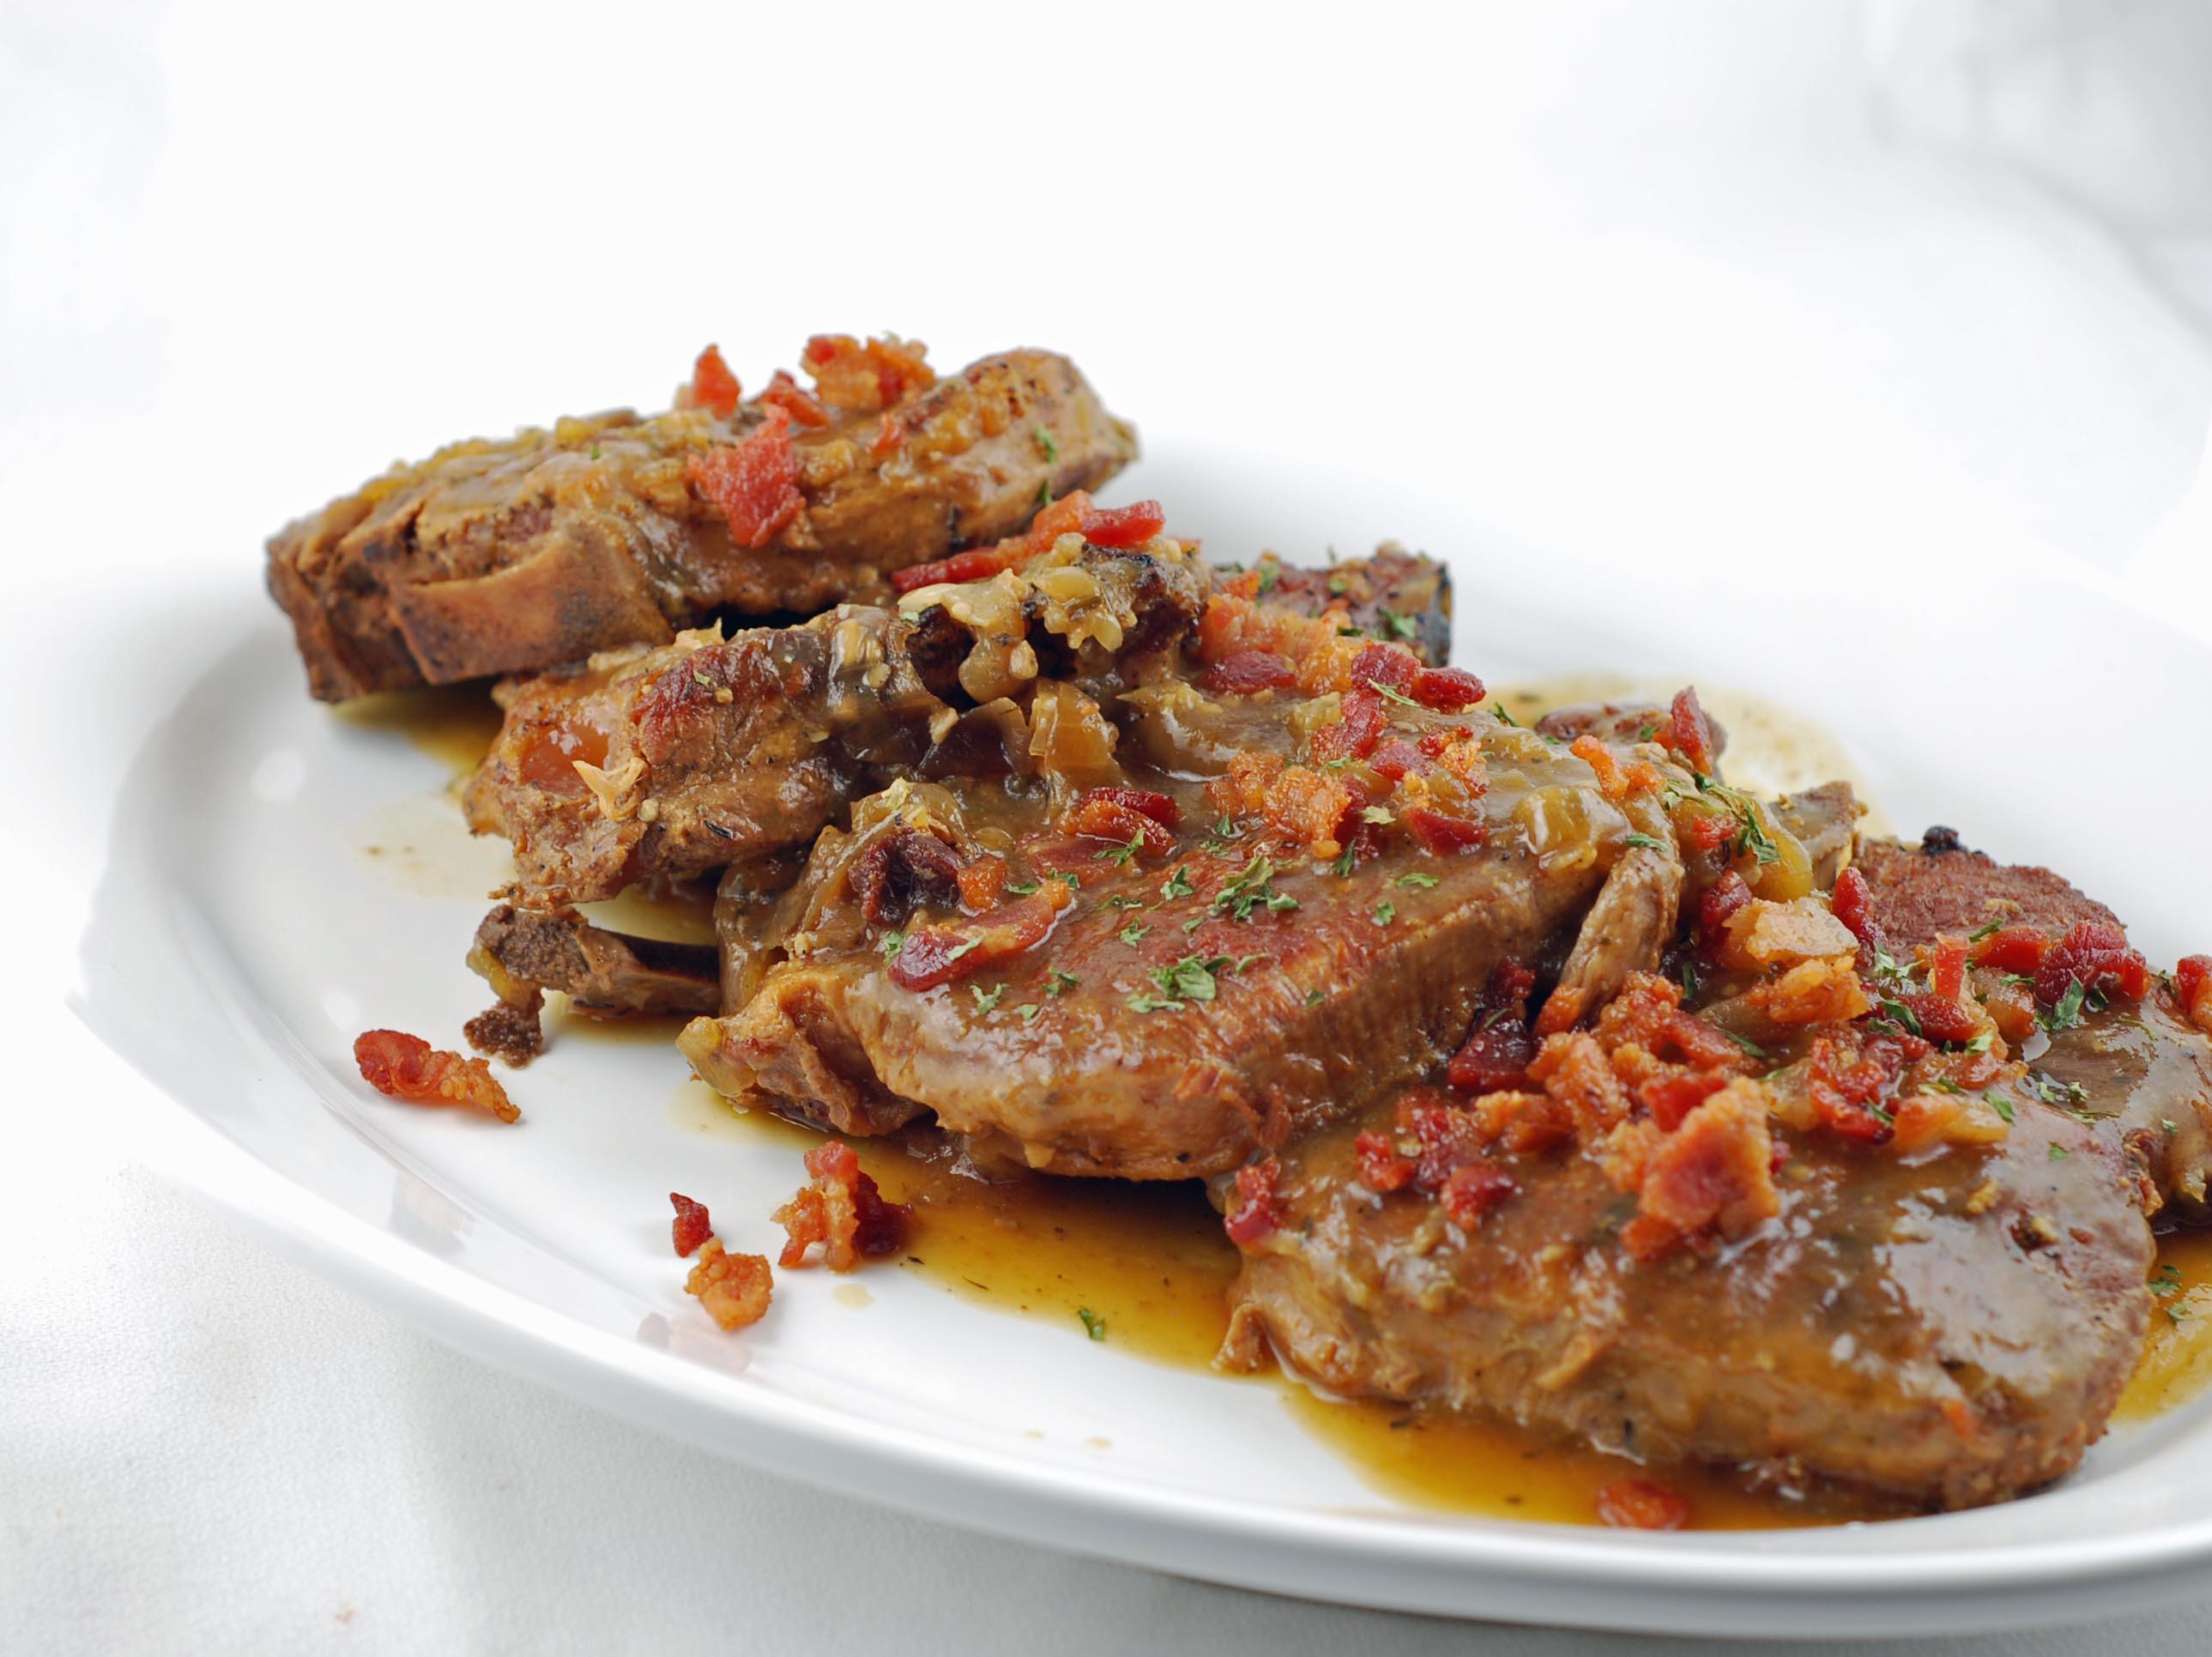 Smothered Pork Chops Slow Cooker  Slow Cooker Smothered Pork Chops